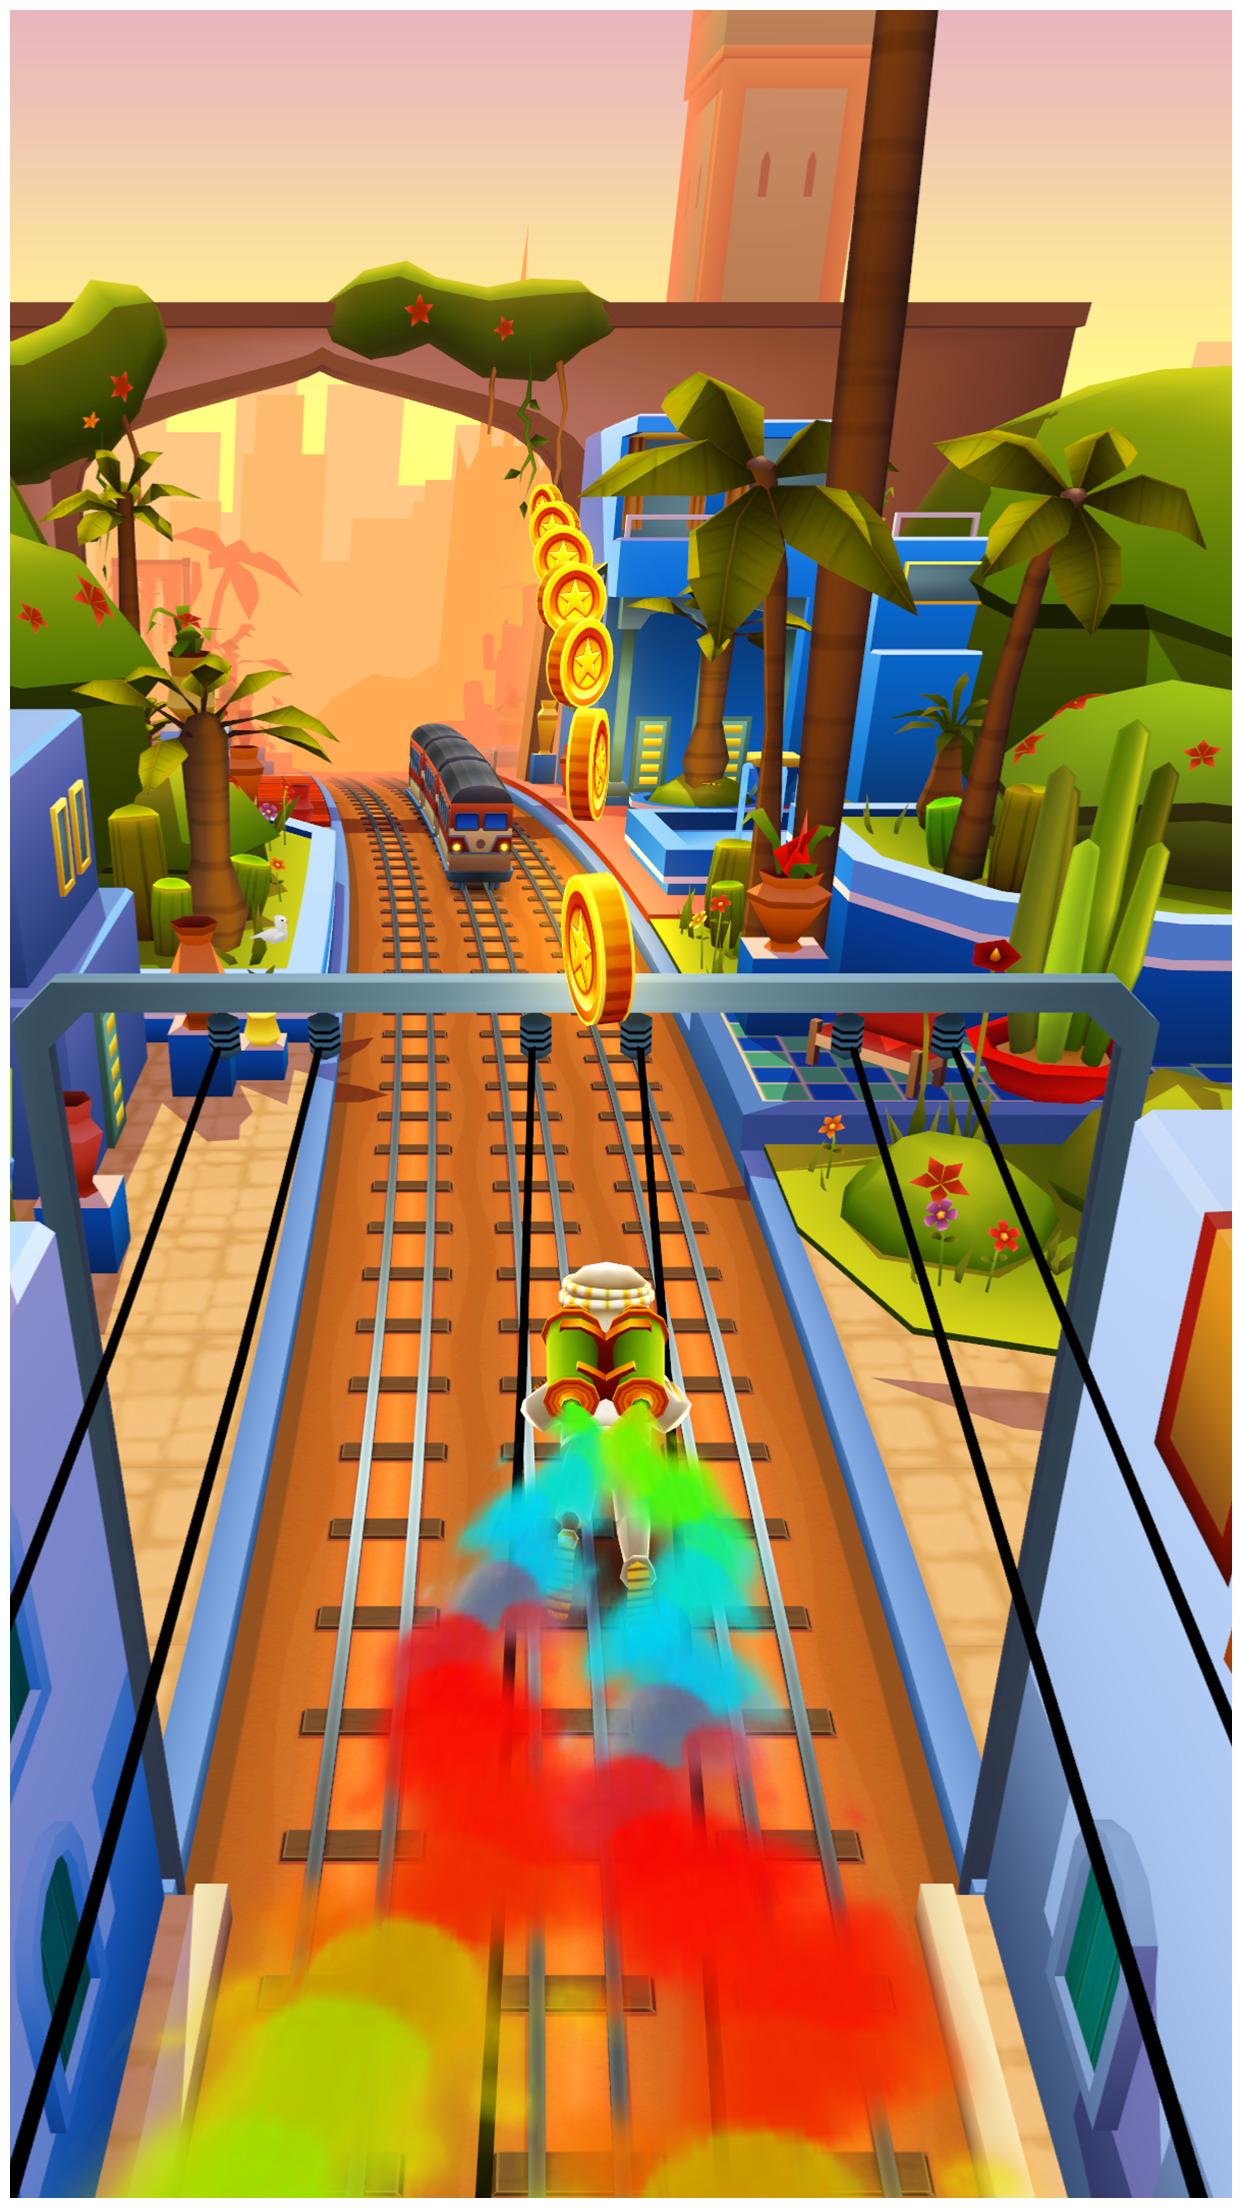 Subway Surfers Screenshot